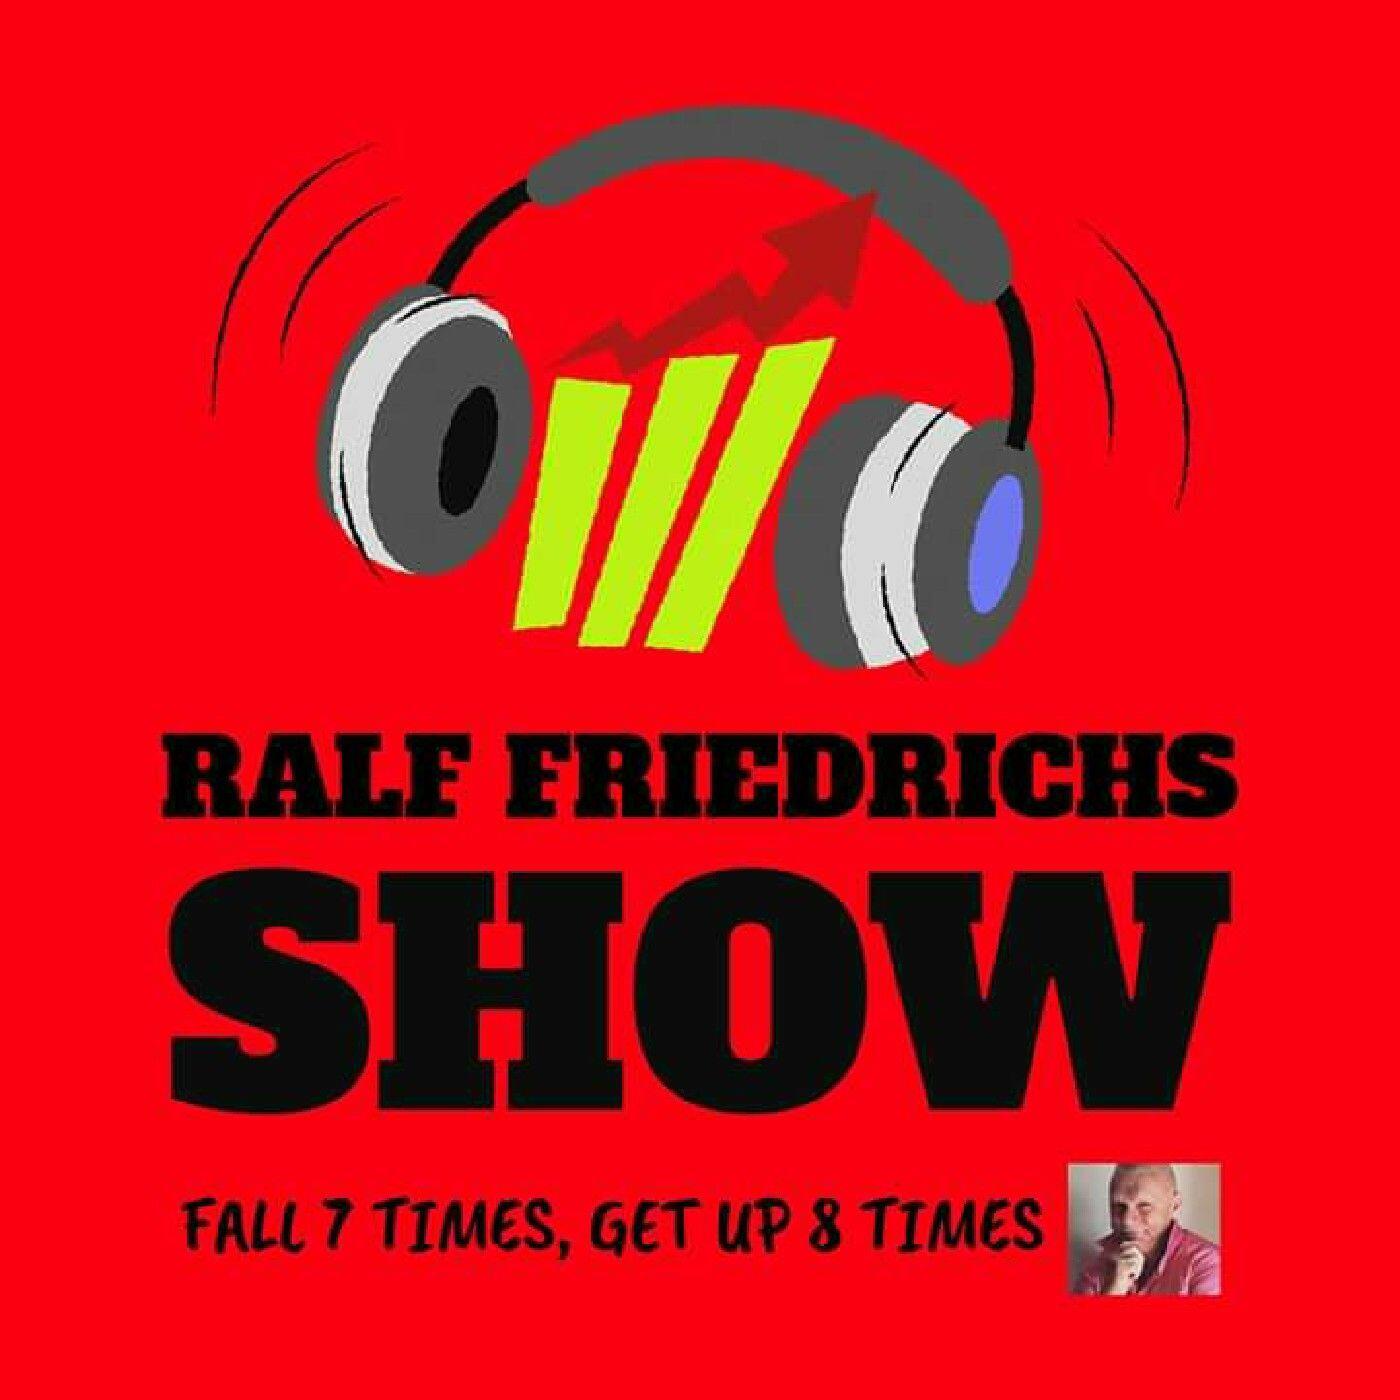 RALF FRIEDRICHS SHOW